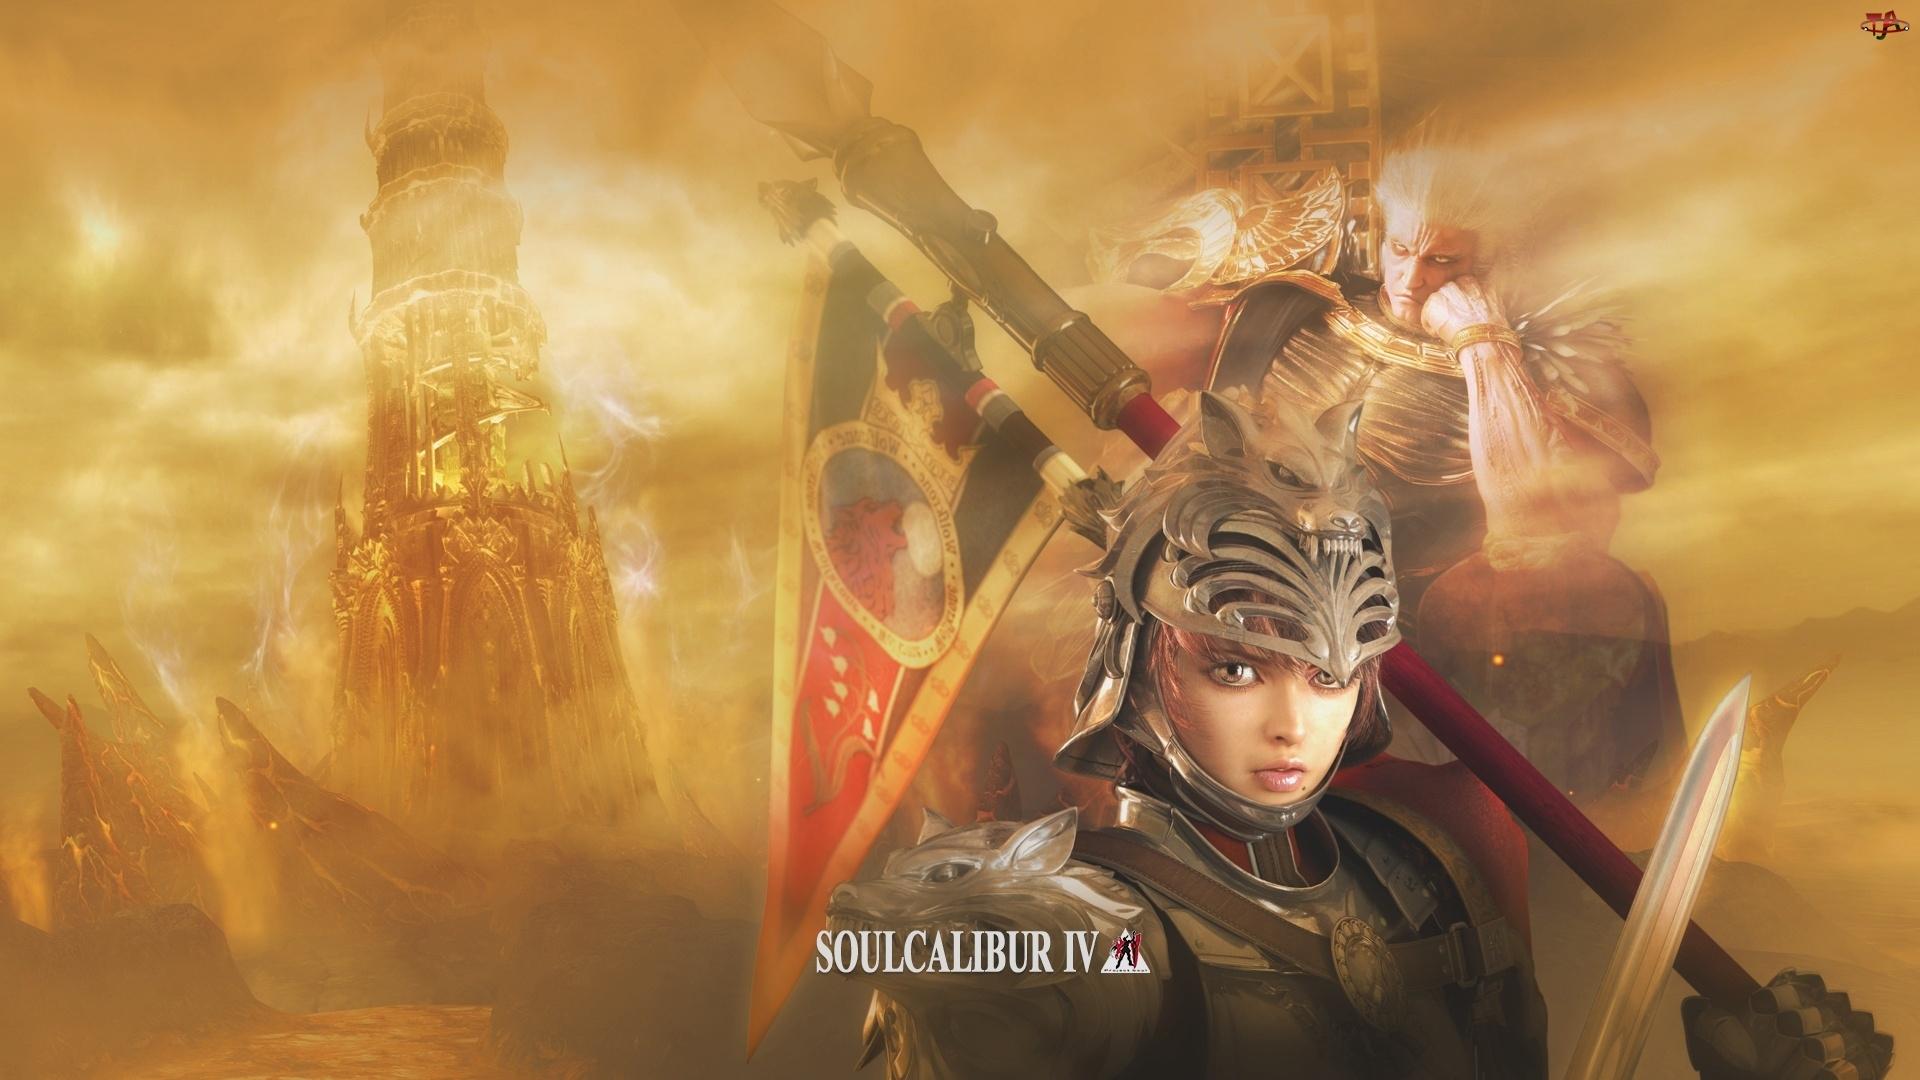 Algor, Soul Calibur IV, Hilde